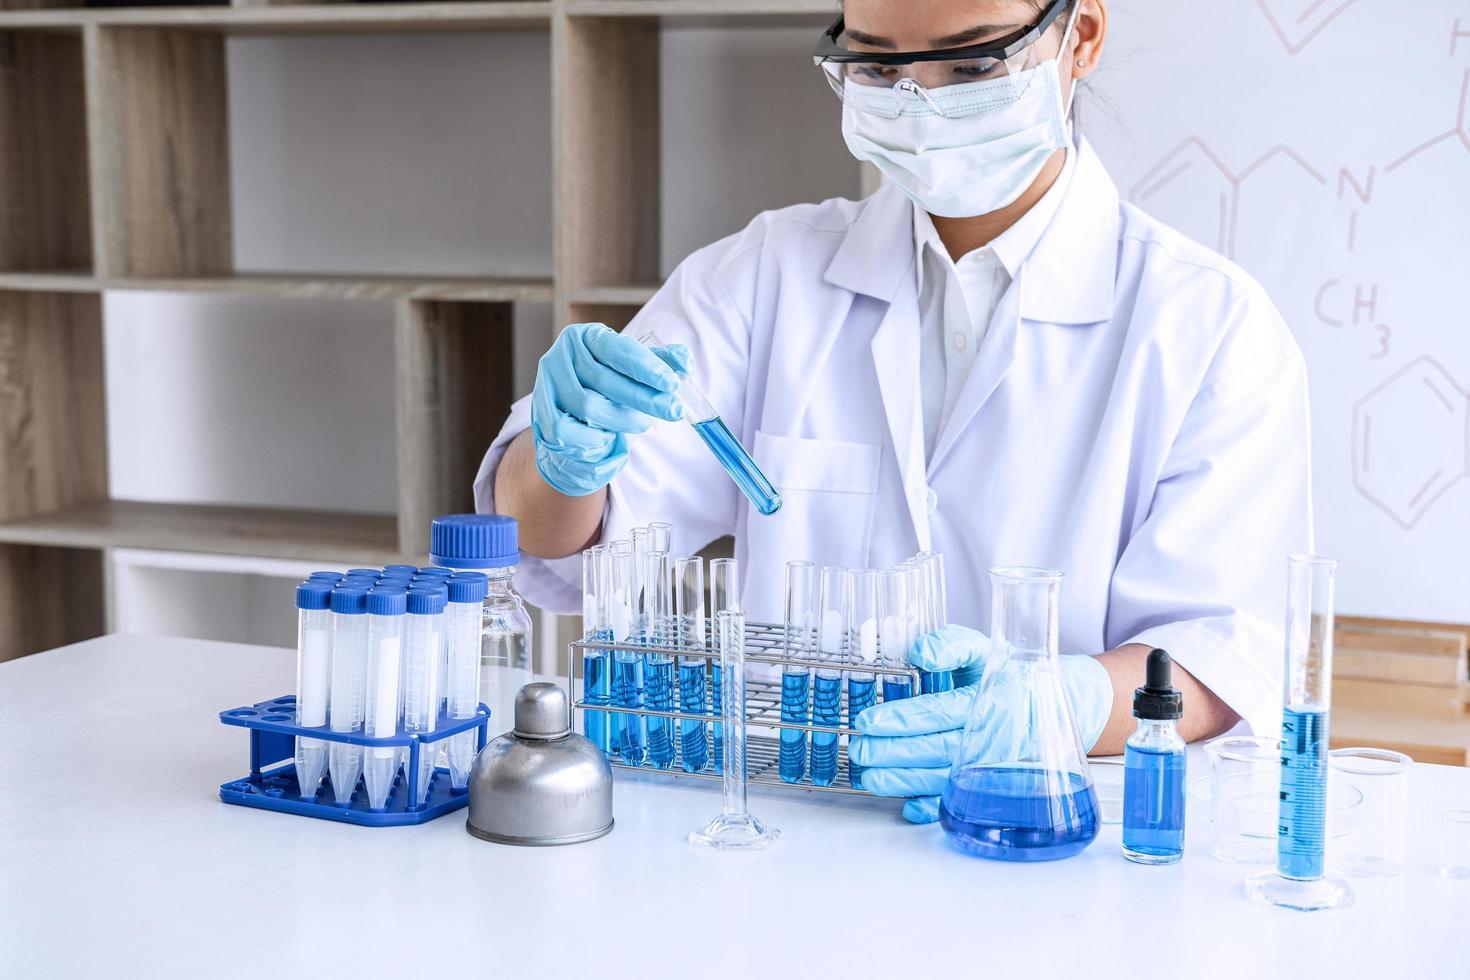 kemist analyserar prov i laboratorium foto